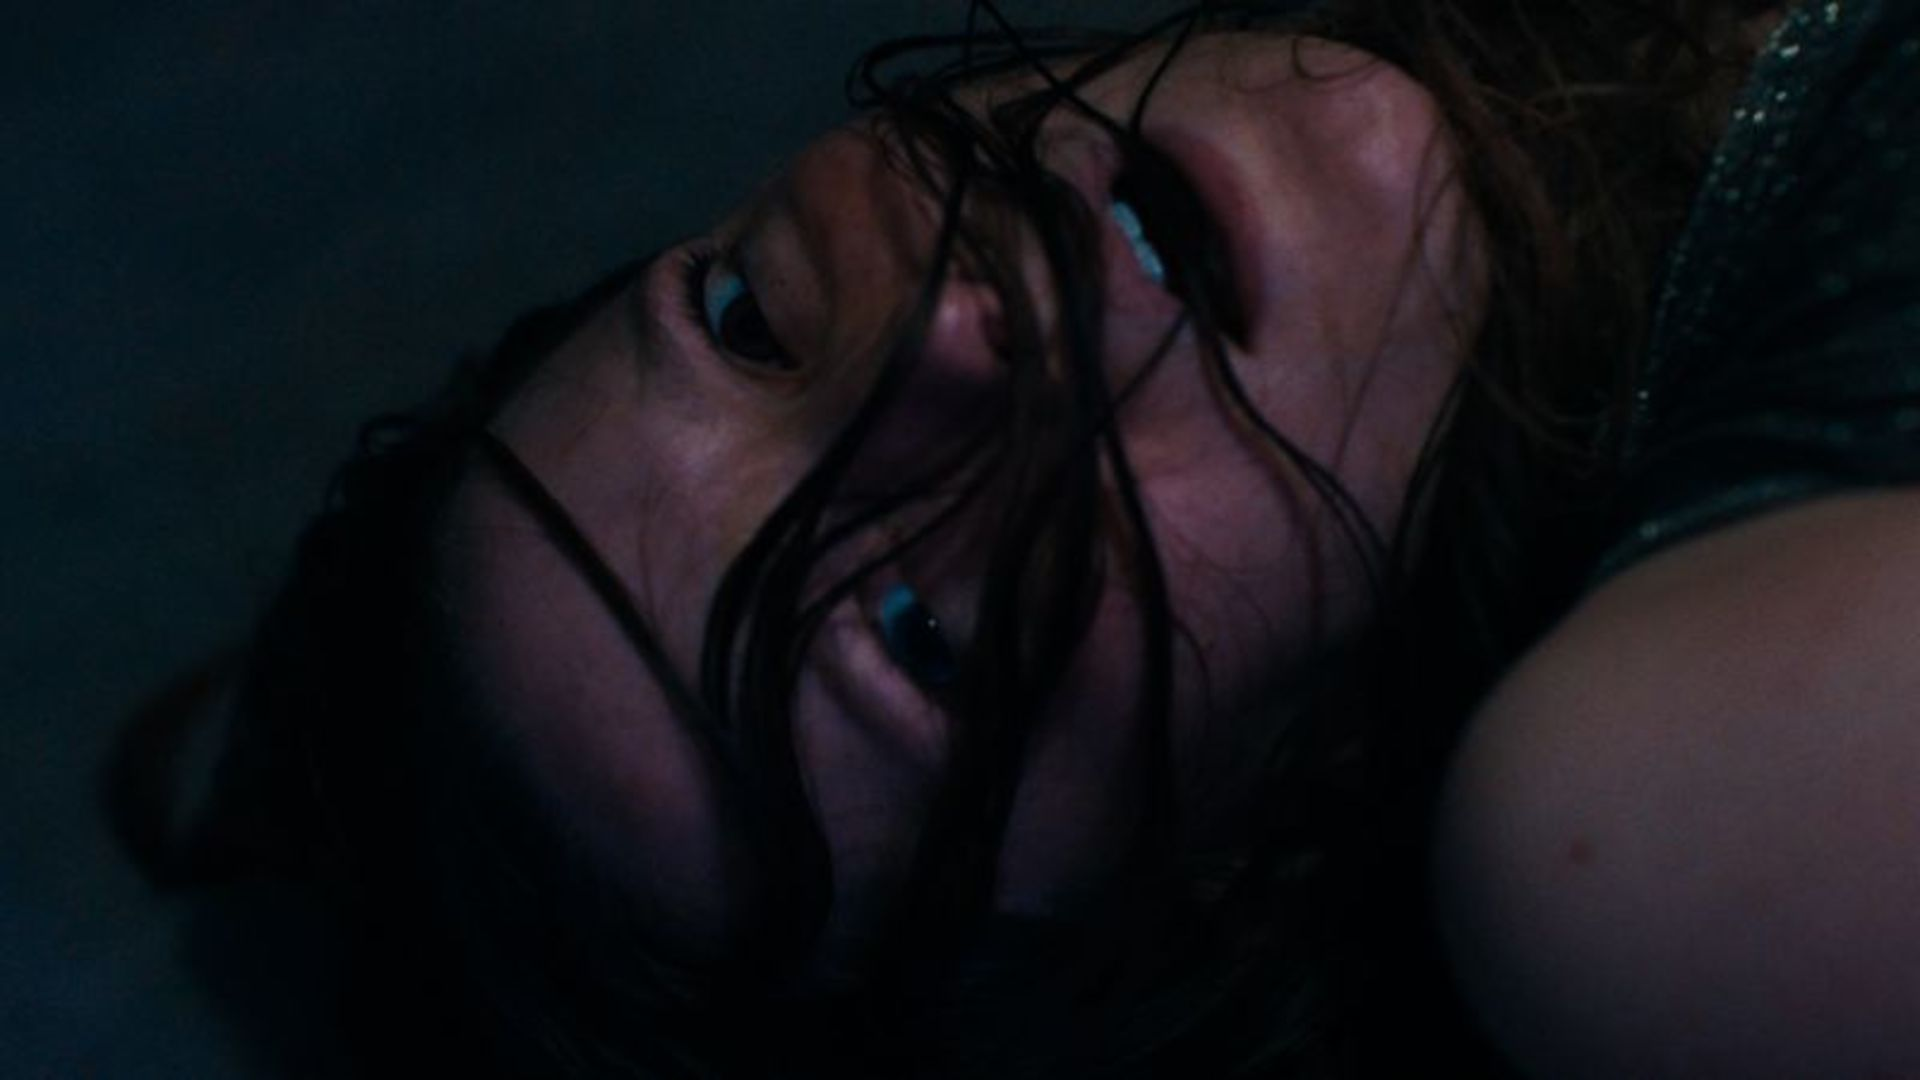 Horrorfilm 'Saint Maud' favoriet bij London Critics Circle Awards